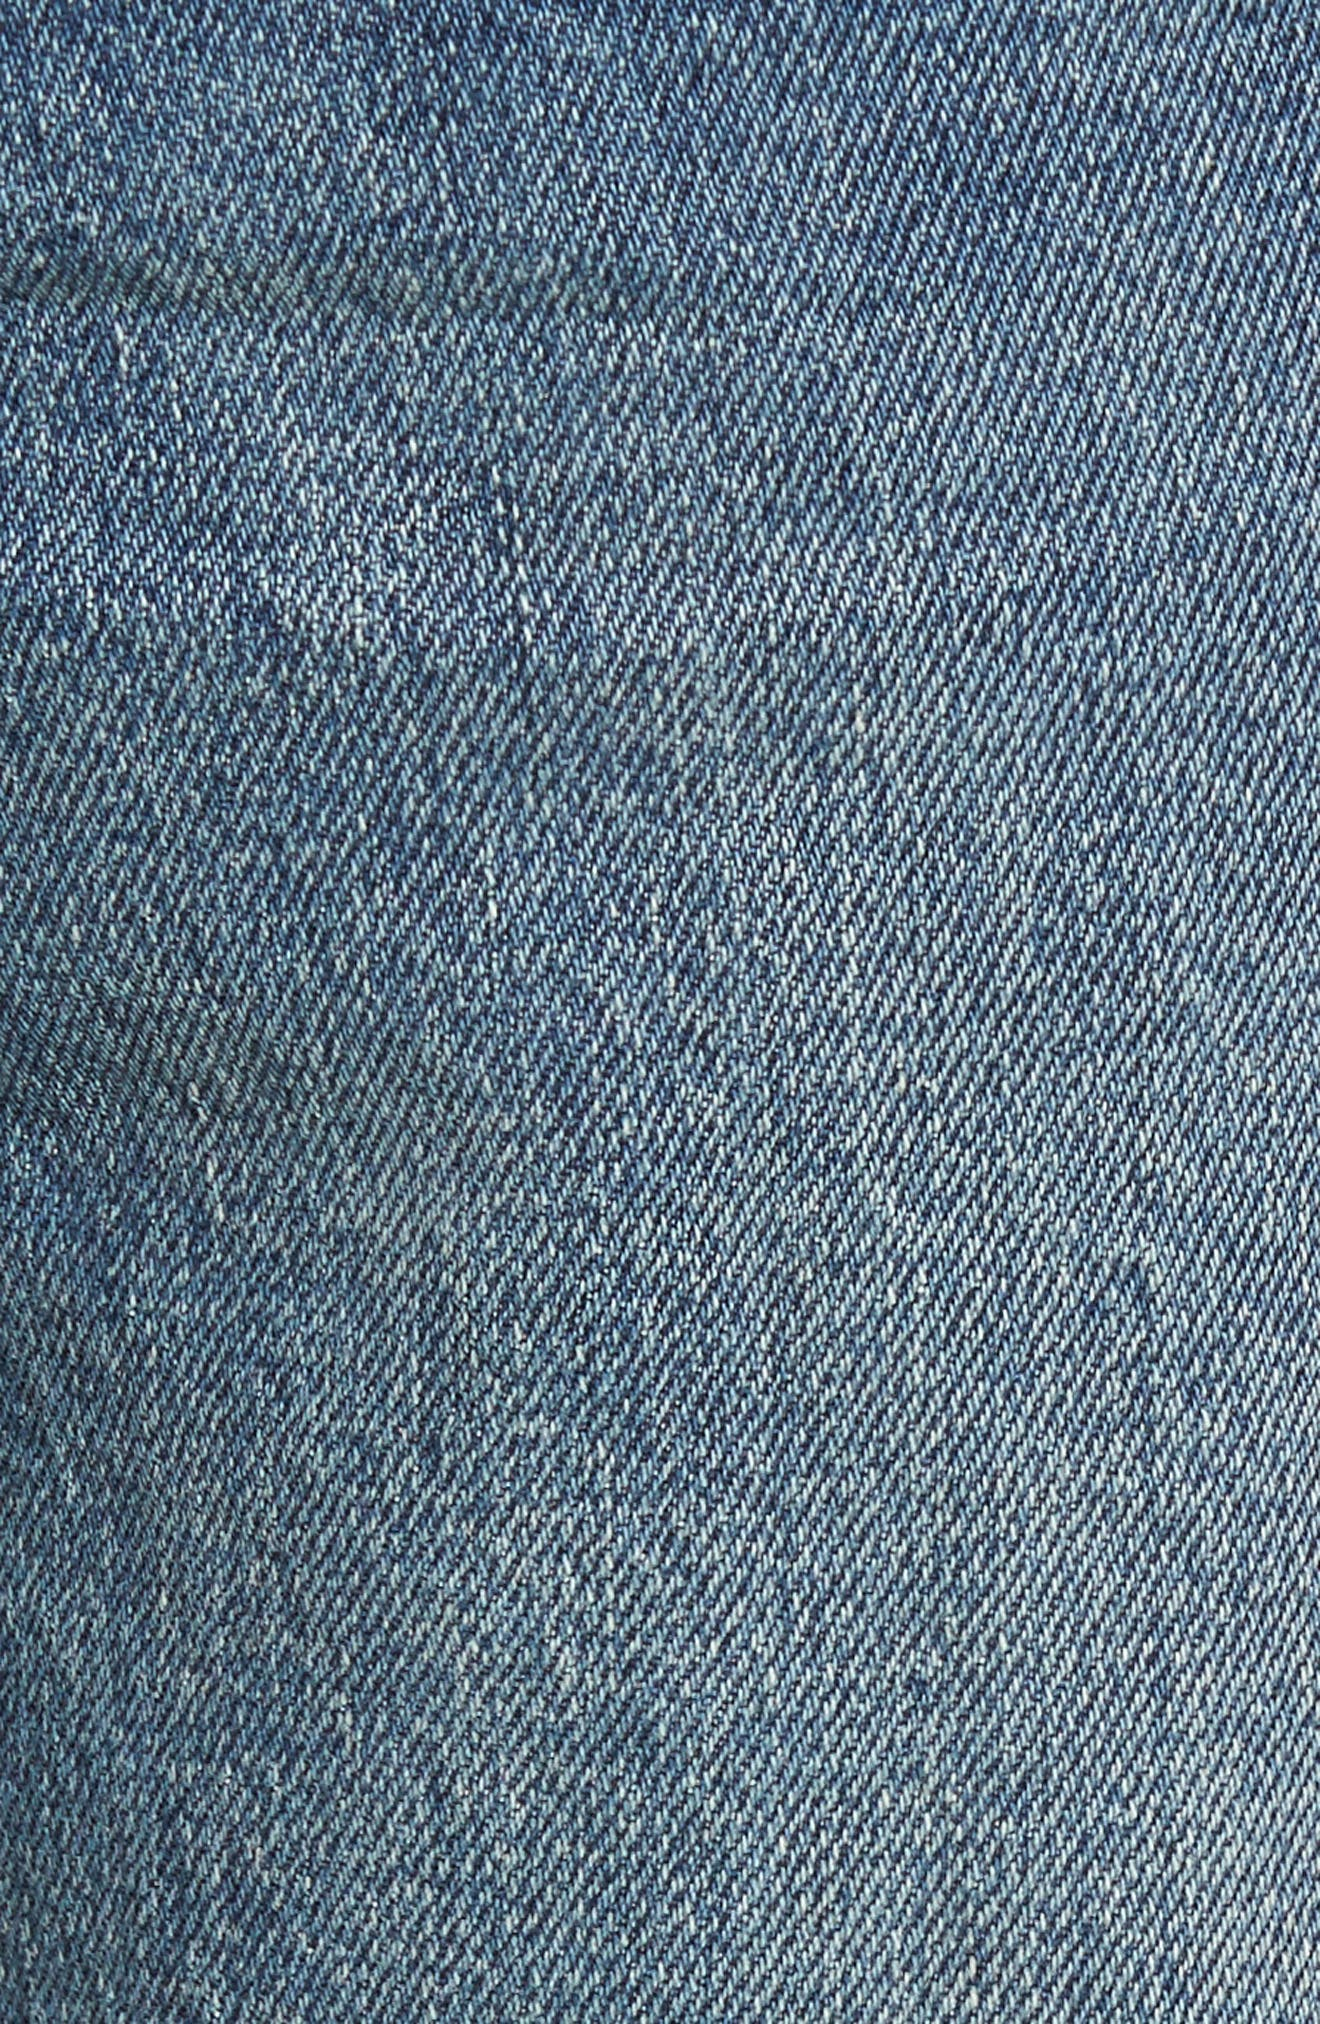 Slim Fit Jeans,                             Alternate thumbnail 5, color,                             Olson